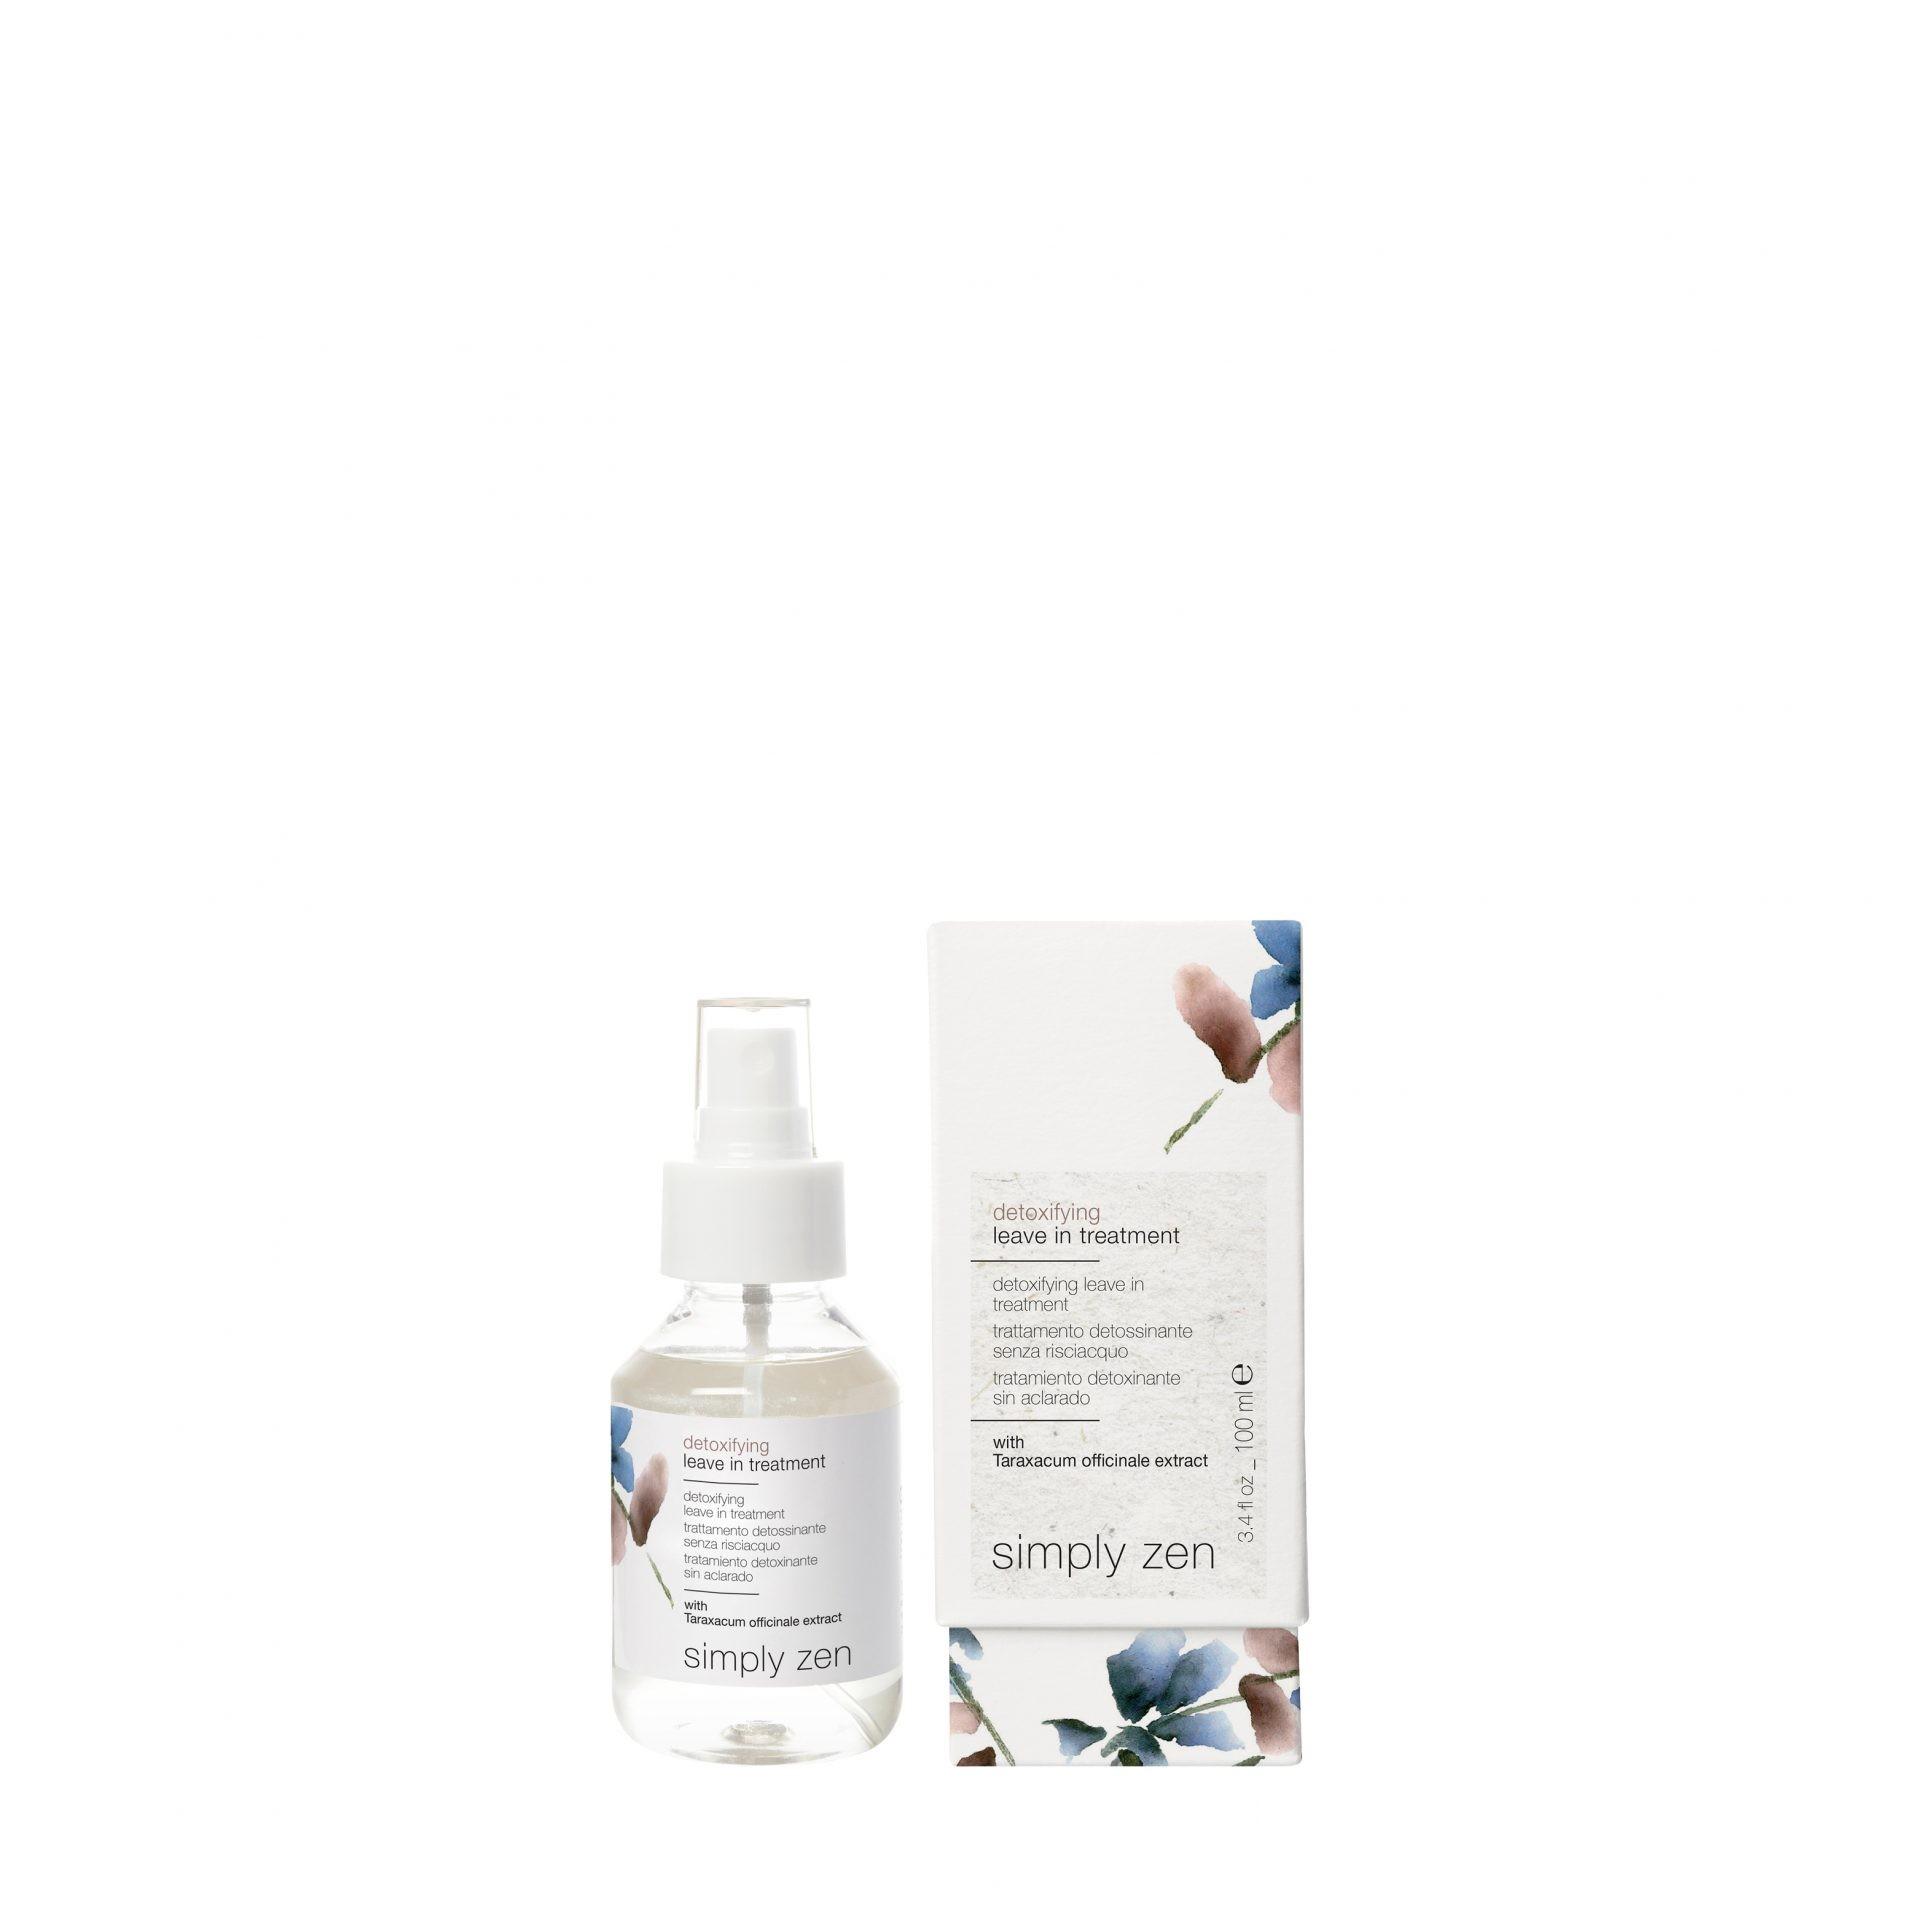 11 IMG SZ singole prodotti 1500x1500px 72 DPI detoxifying leave in treatment